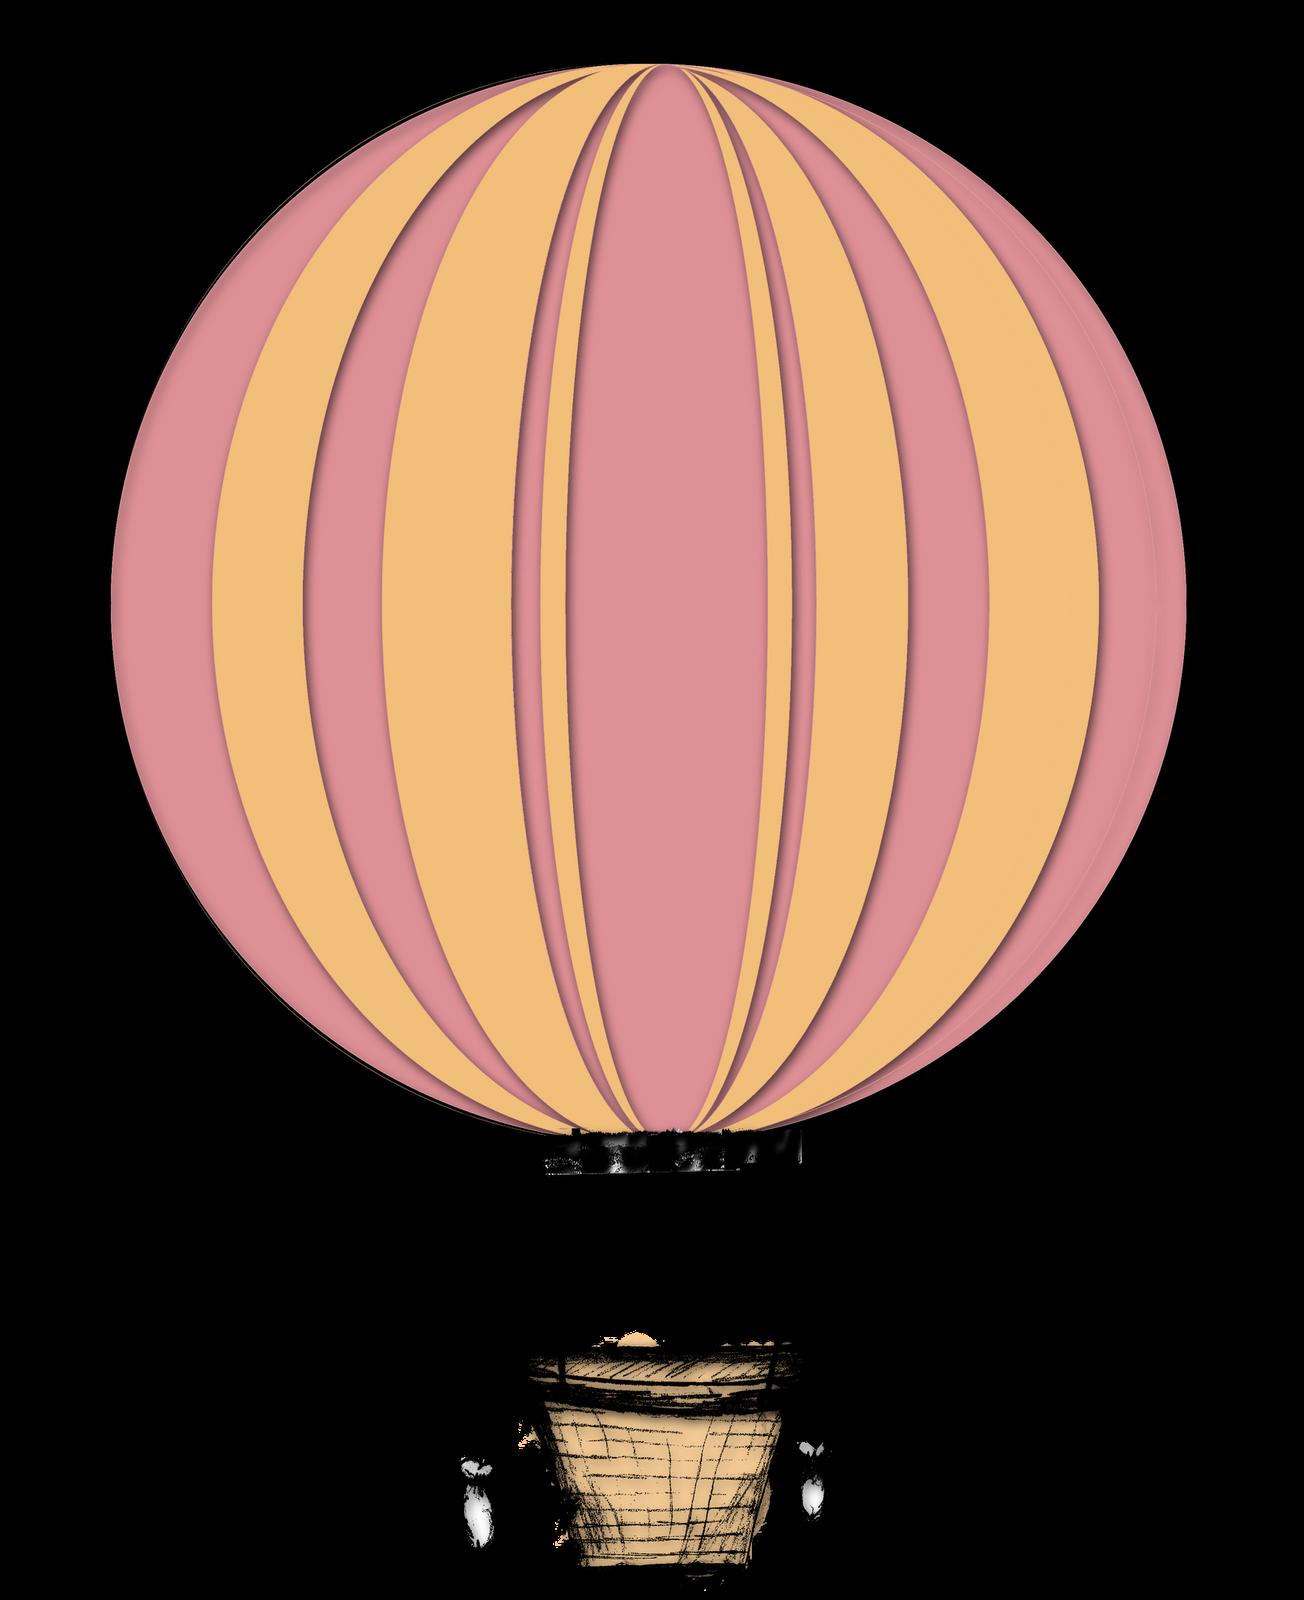 Hot Air Balloon Clip Art #1308-Hot Air Balloon Clip Art #1308-5